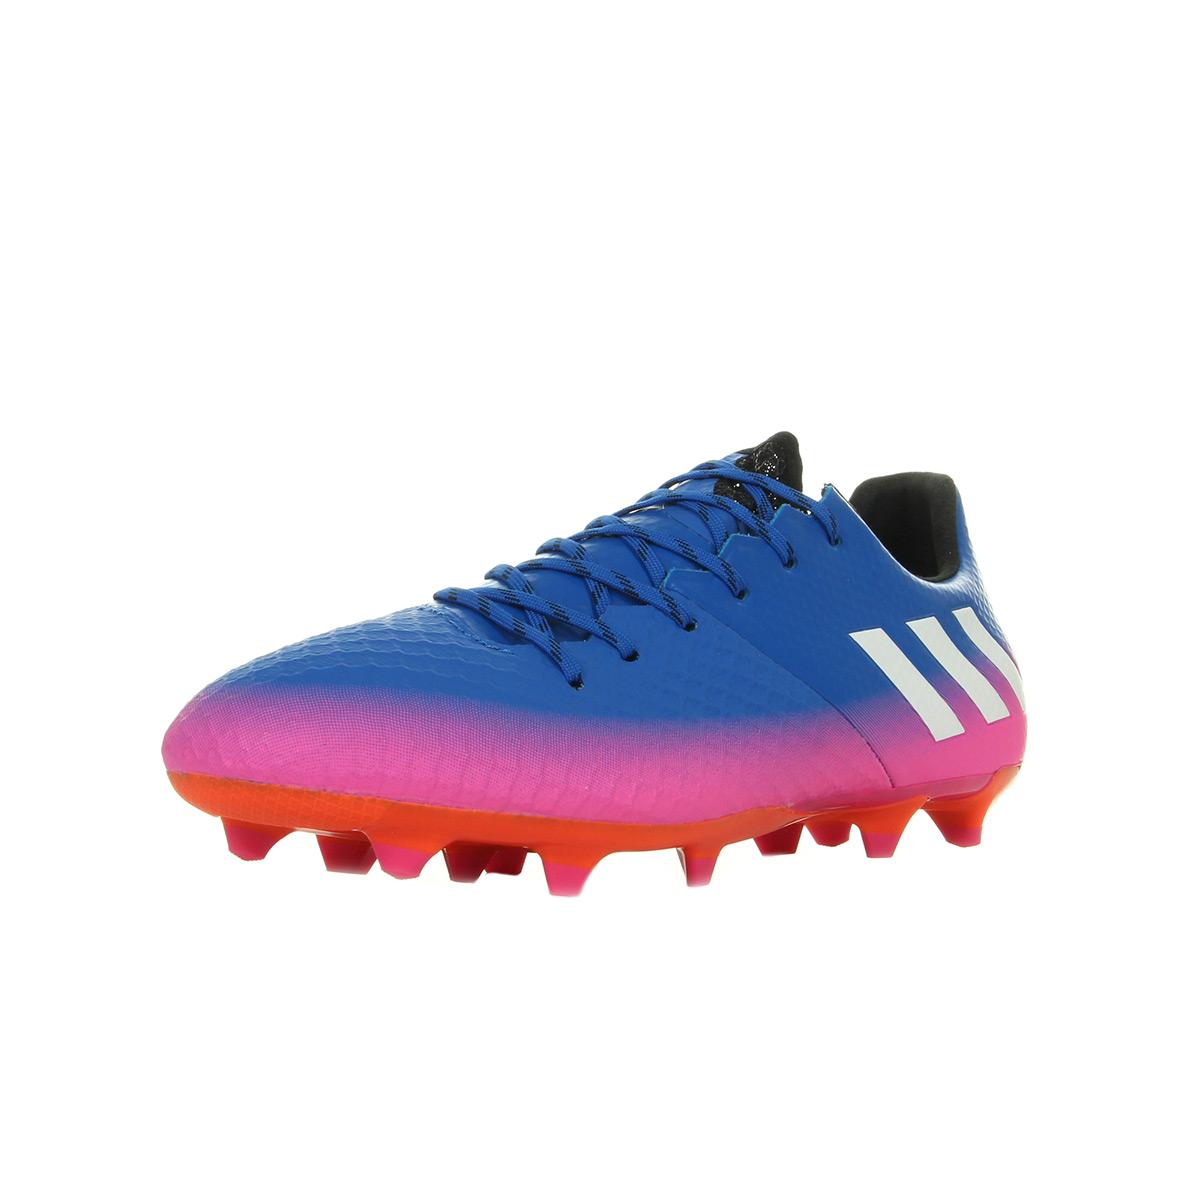 85508c9157e adidas Performance Messi 16.2 FG BA9145